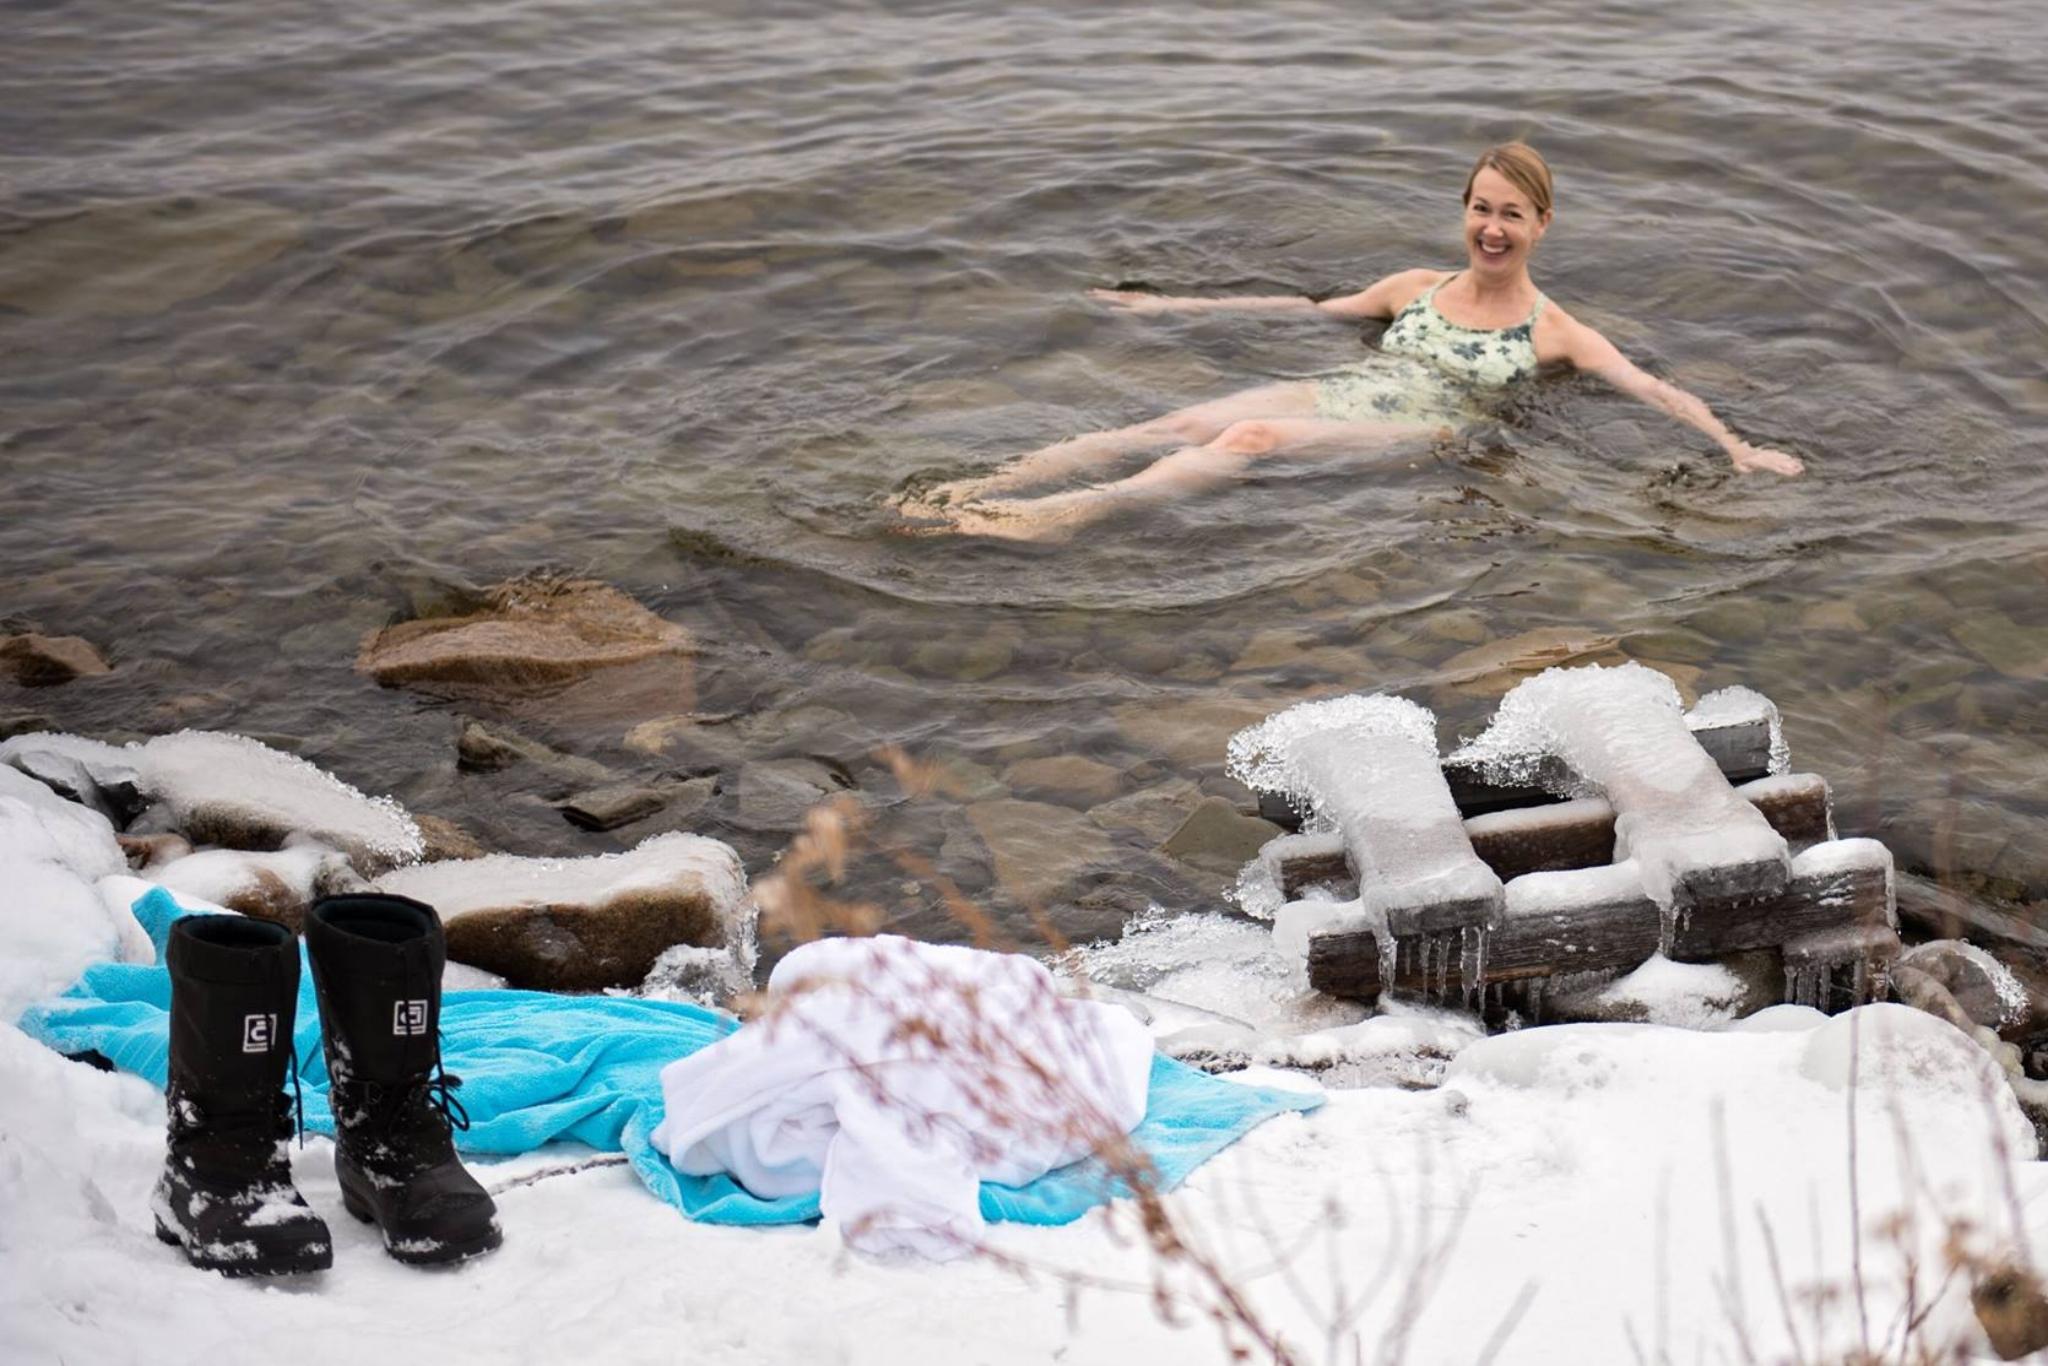 Crazy frozen lake swimmer!